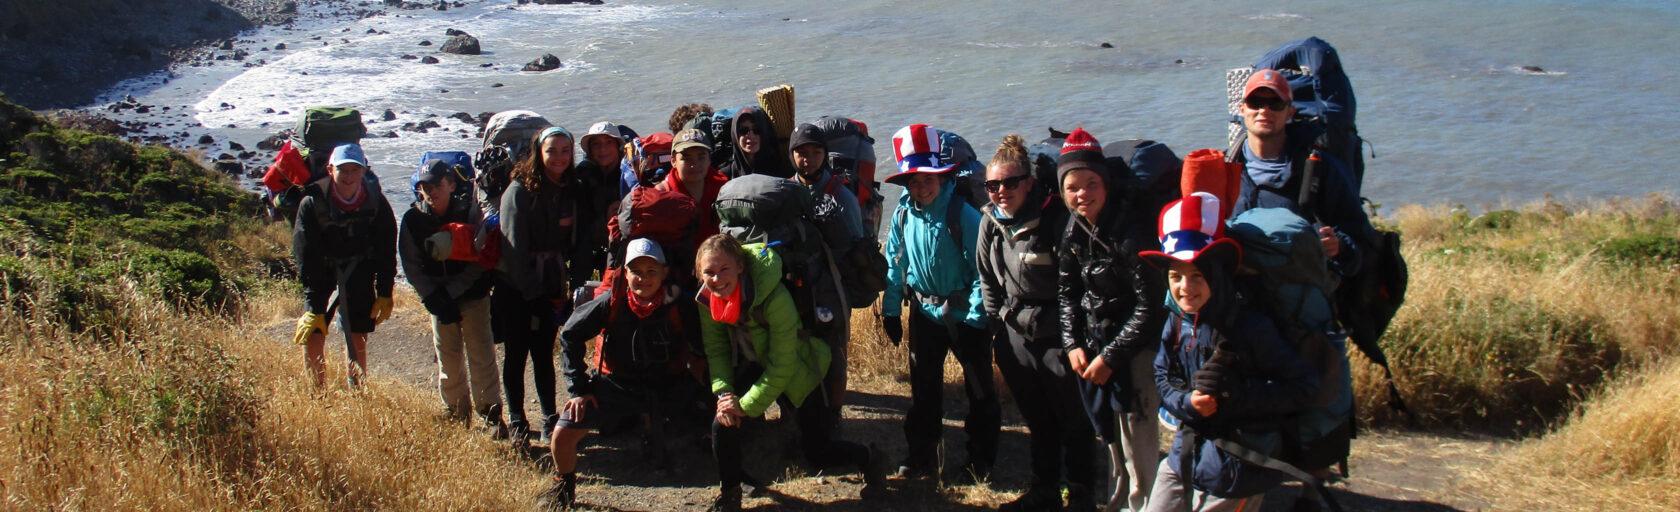 California Explorer group photo